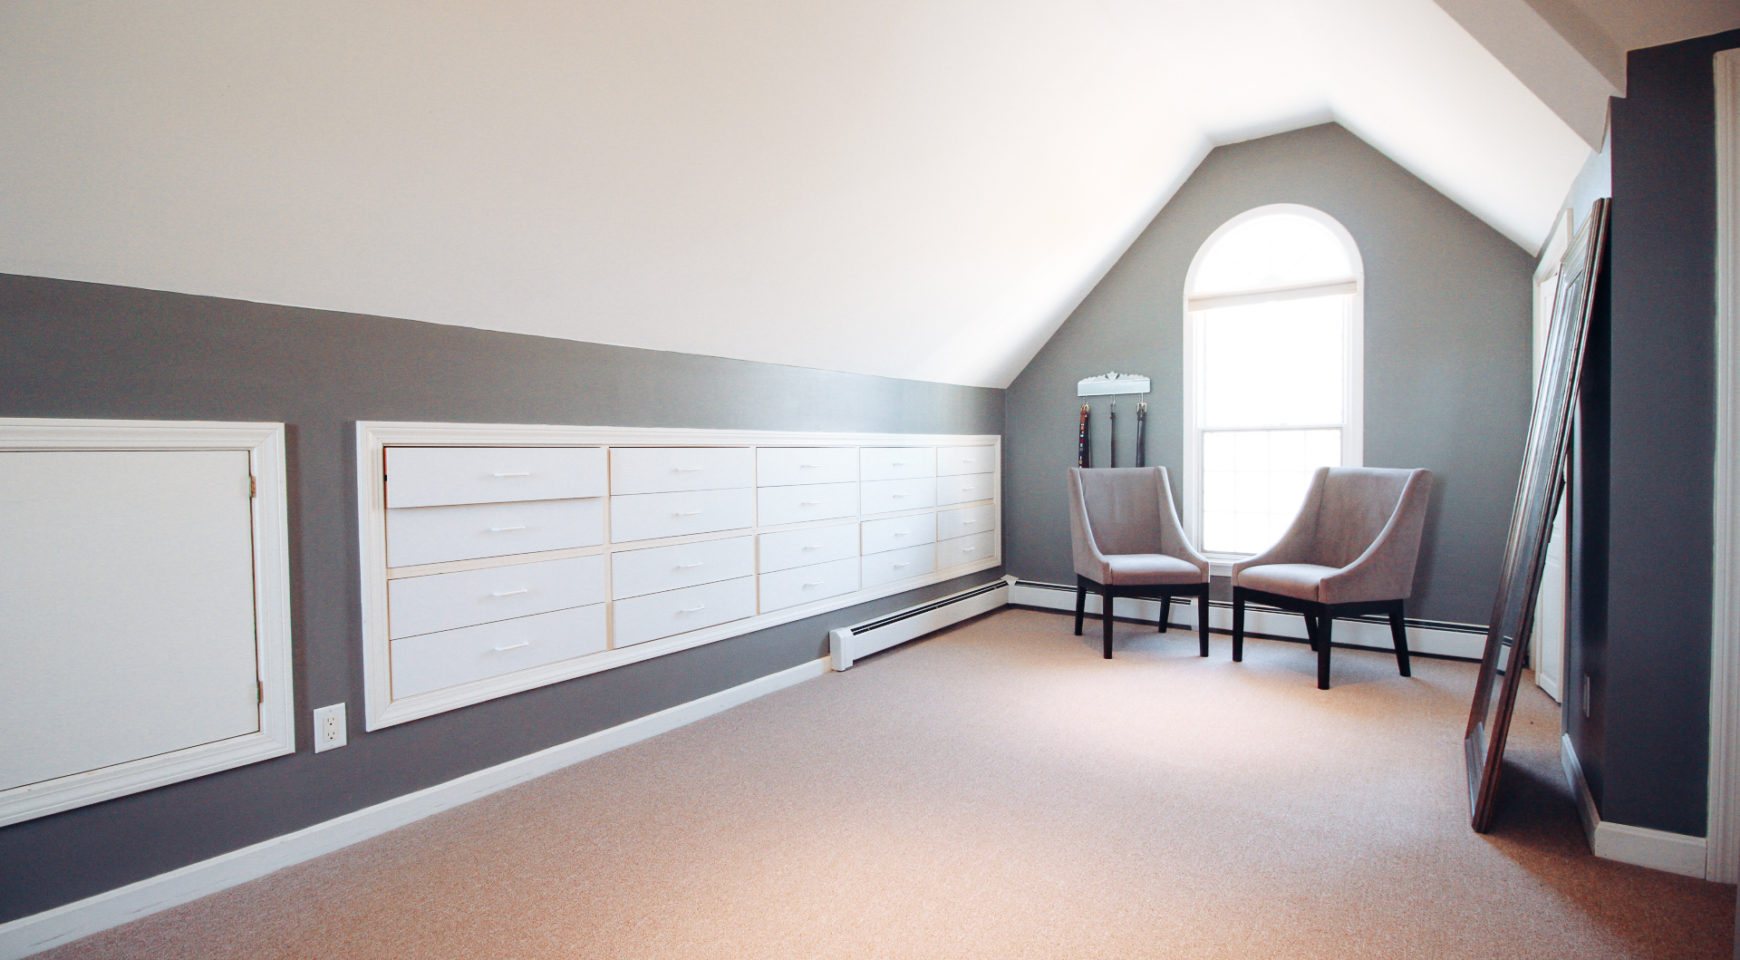 Luxe_and_Livable_Interior_Design_Blog_by_Maloney_Interiors_Newport_Rhode_Island_Fitzpatrick_Team_Remax_24.jpg